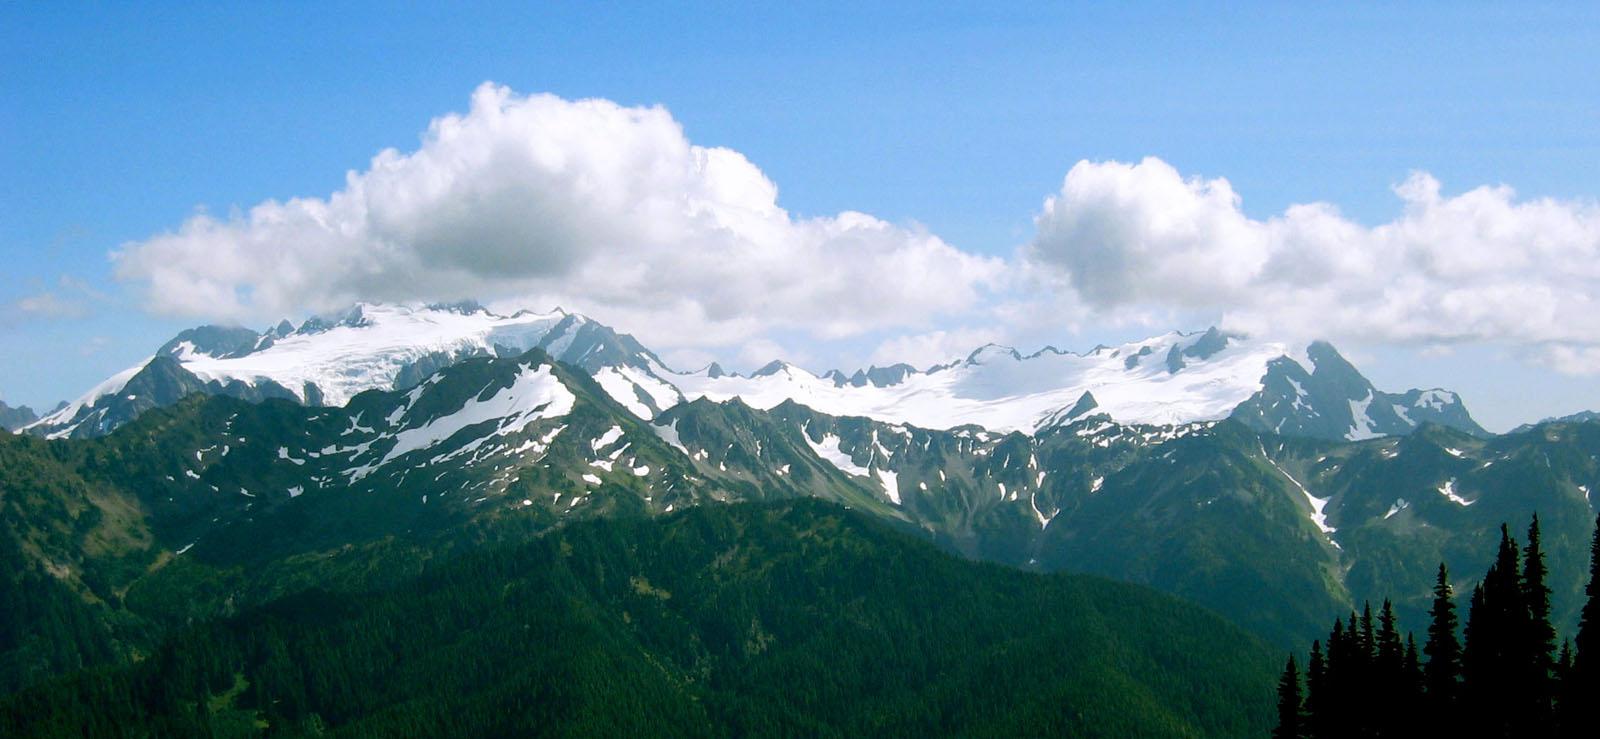 File:Mount Olympus-JP.jpg - Wikimedia Commons